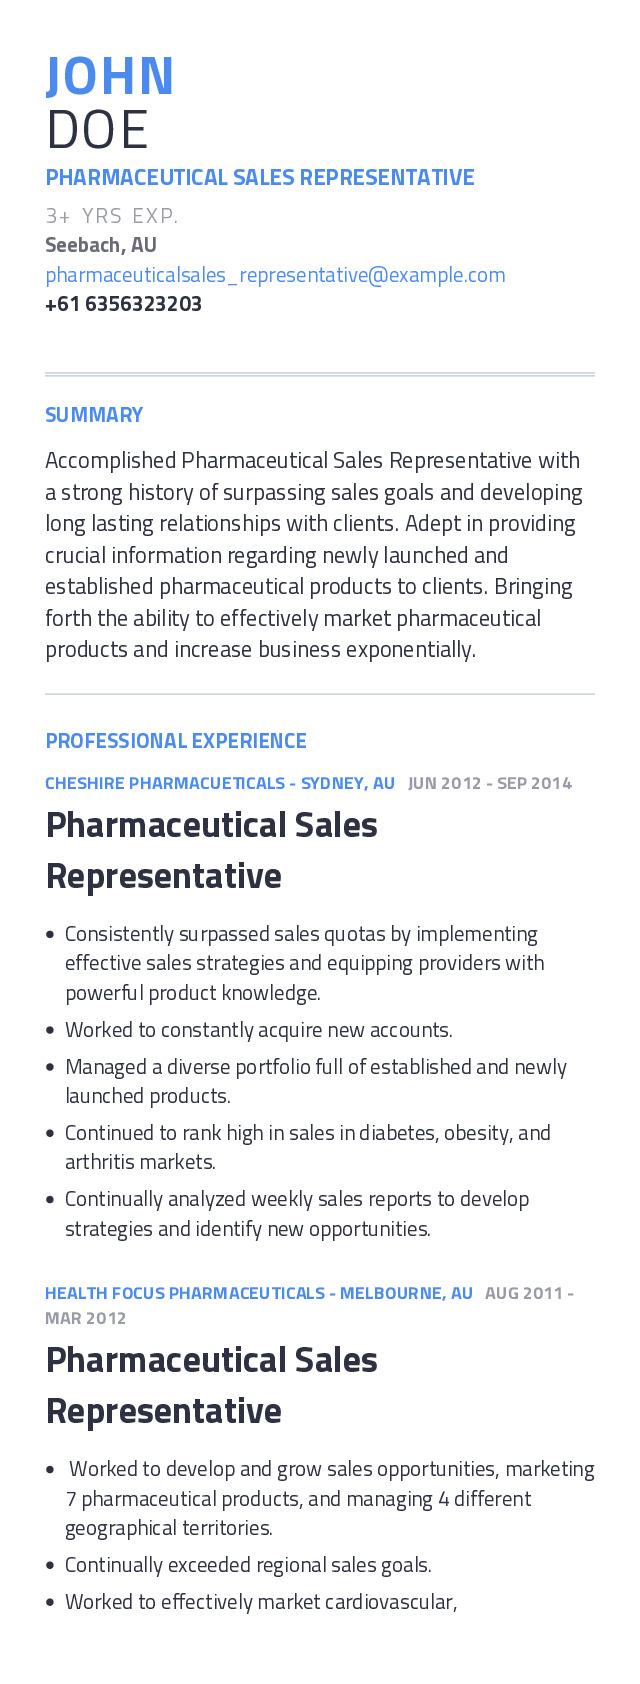 Pharmaceutical Sales Representative Mobile Resume Example